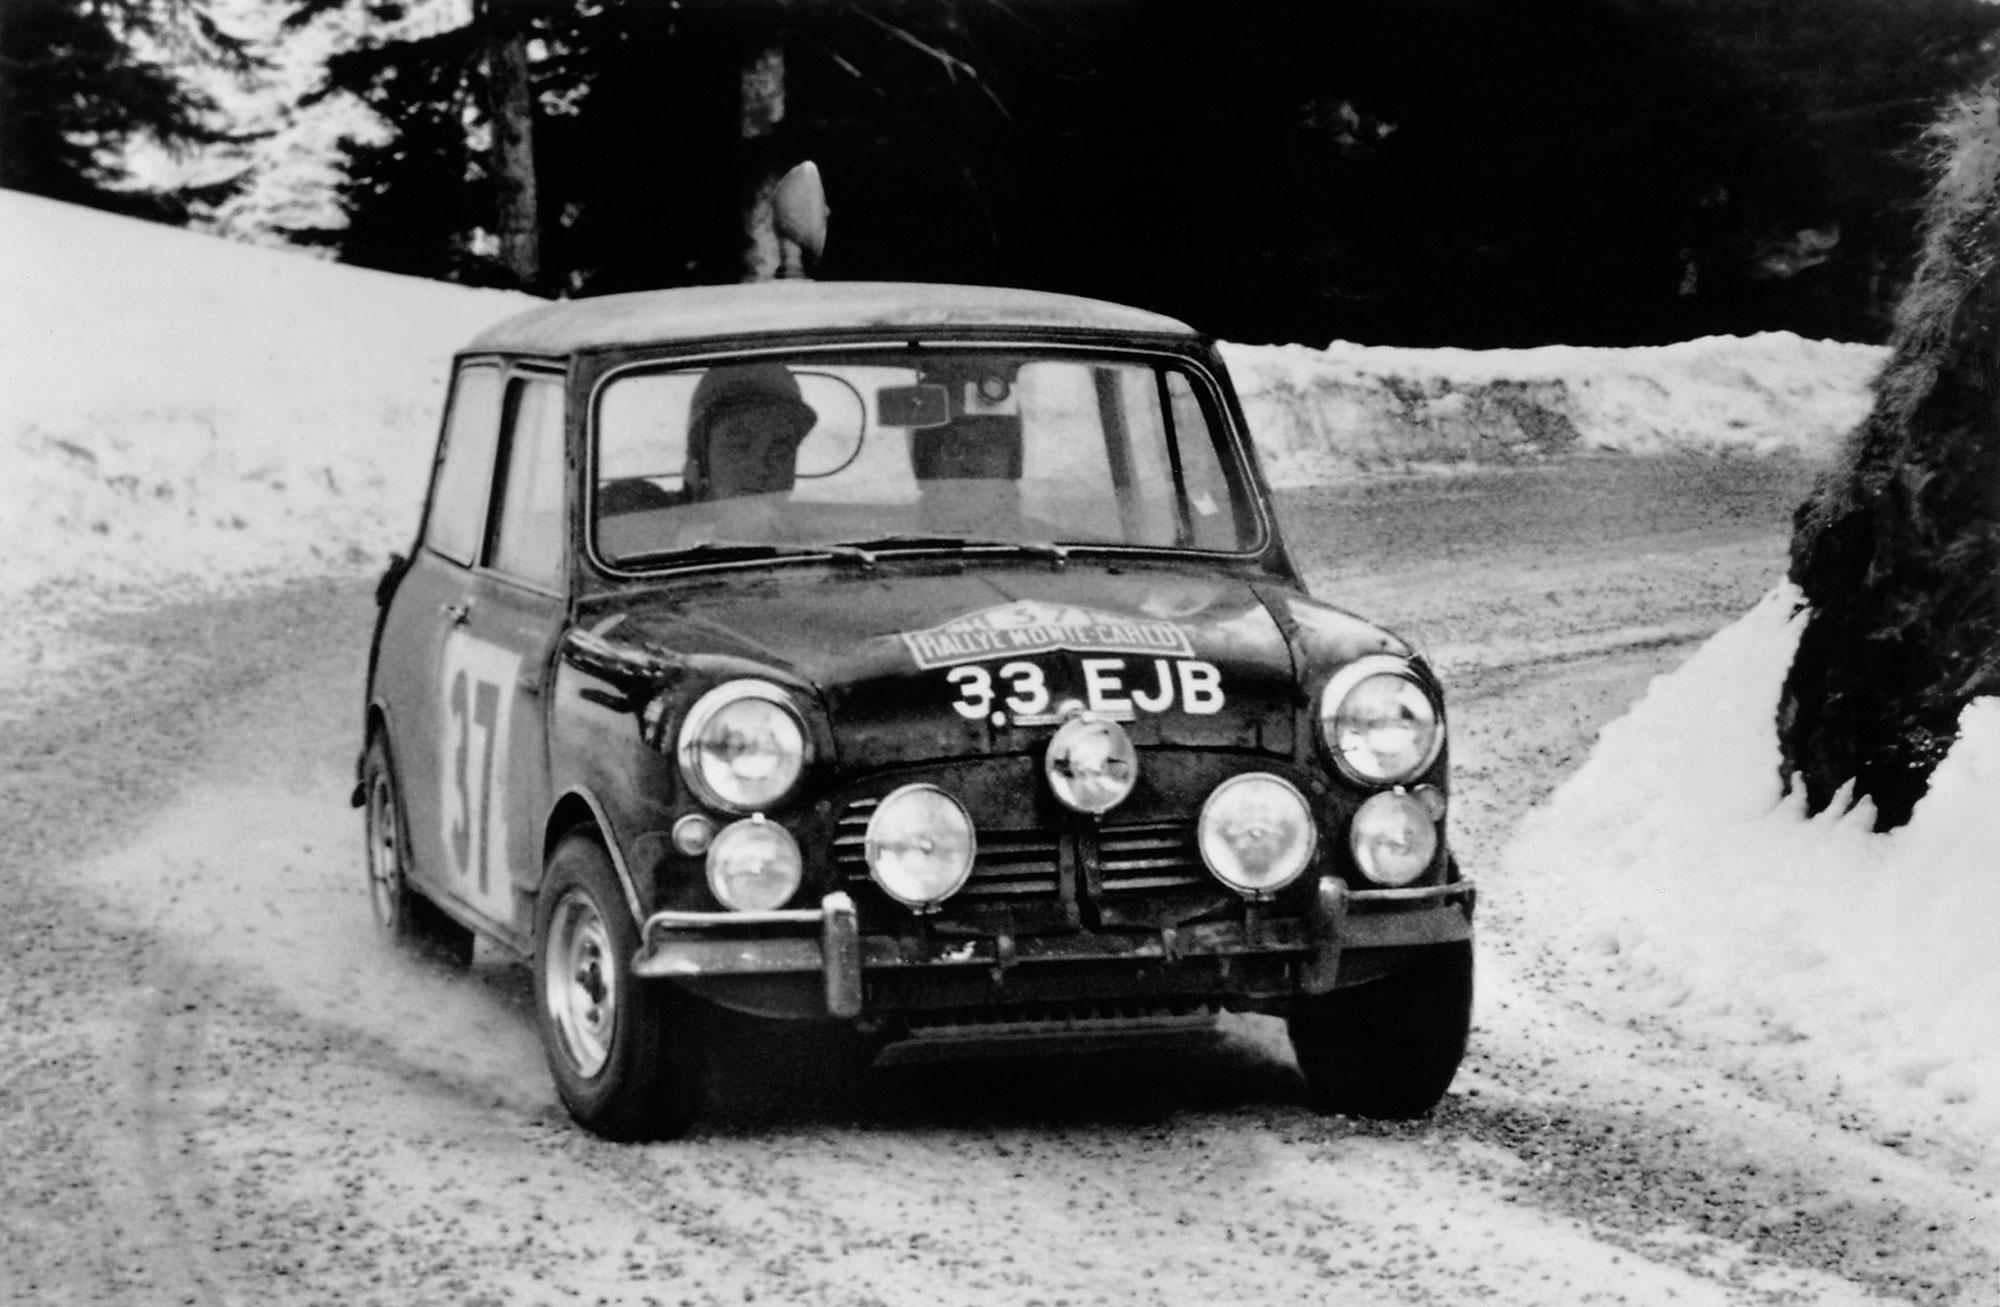 Paddy Hopkirk driving a Mini Cooper S in the 1964 Rallye Monte Carlo